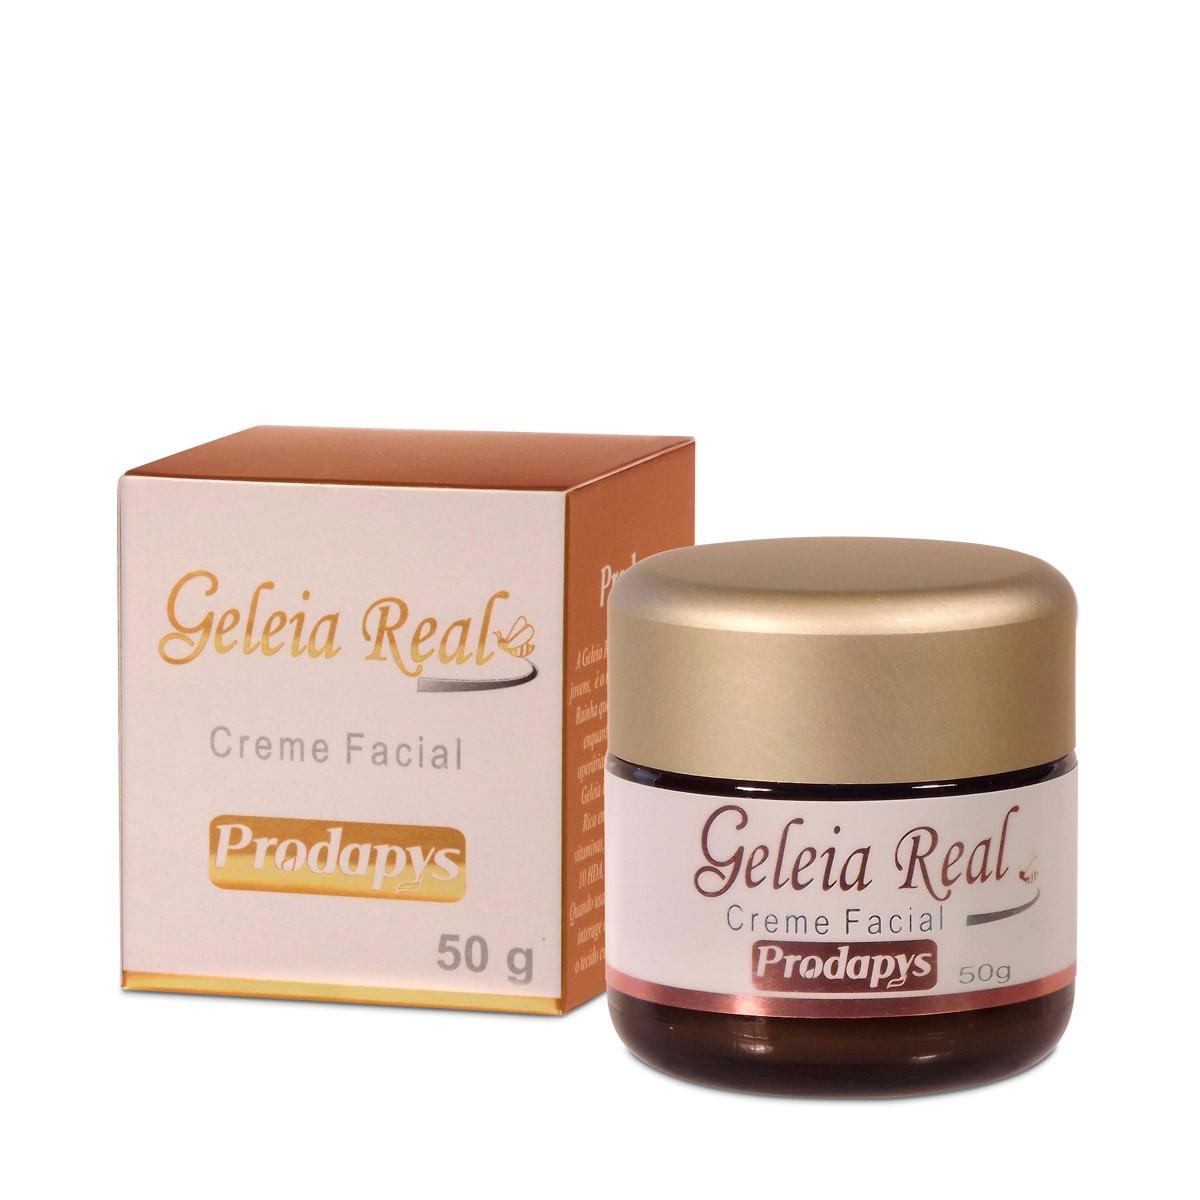 Creme Facial - Geleia Real 50g